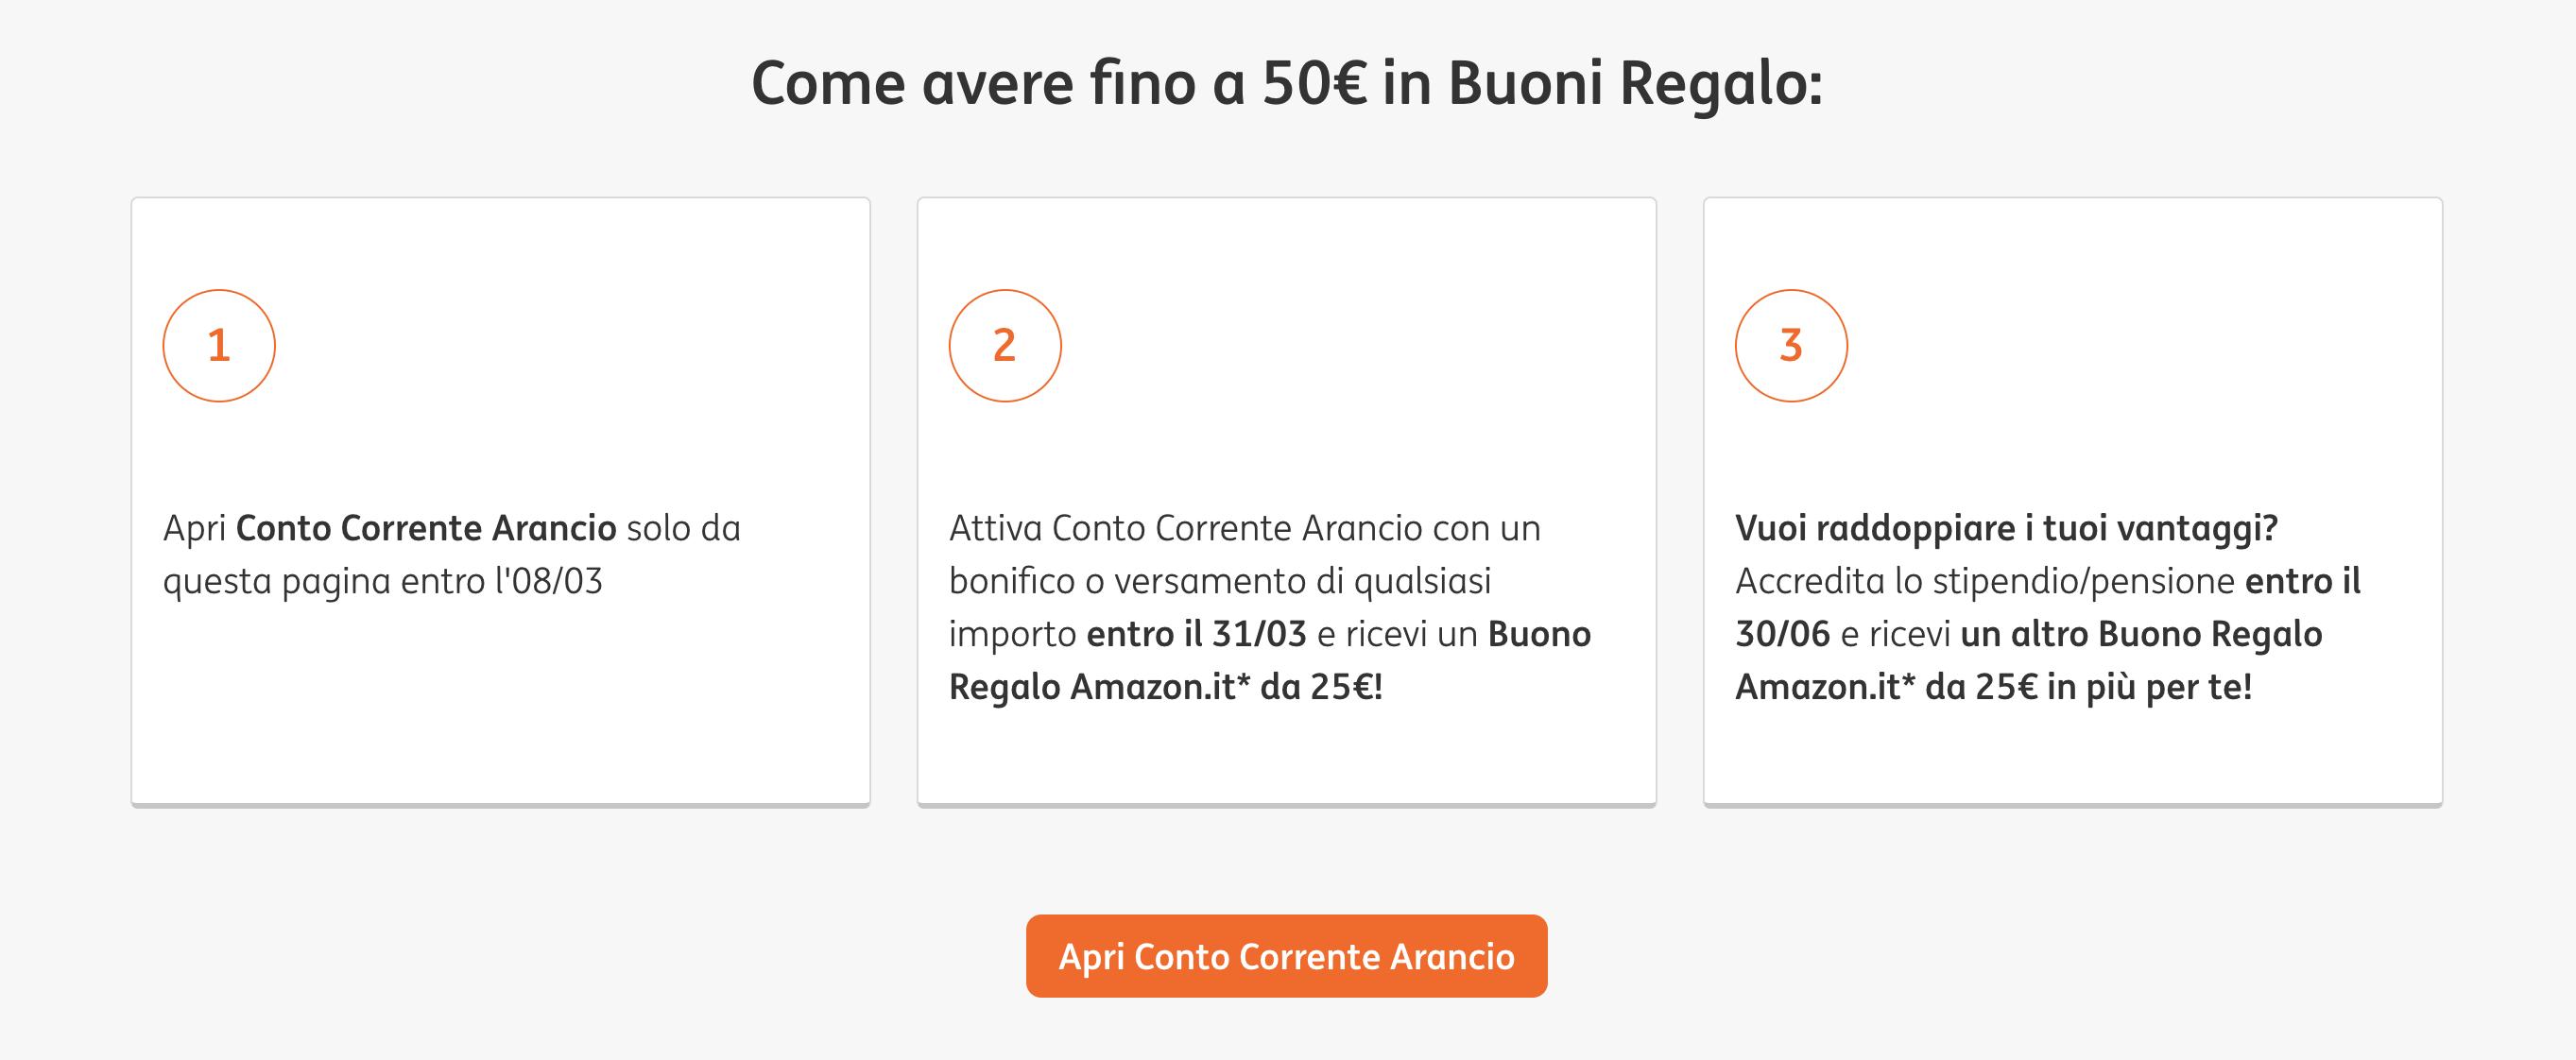 ING regala buoni Amazon fino a 50 euro aprendo gratis un Conto Corrente Arancio 2